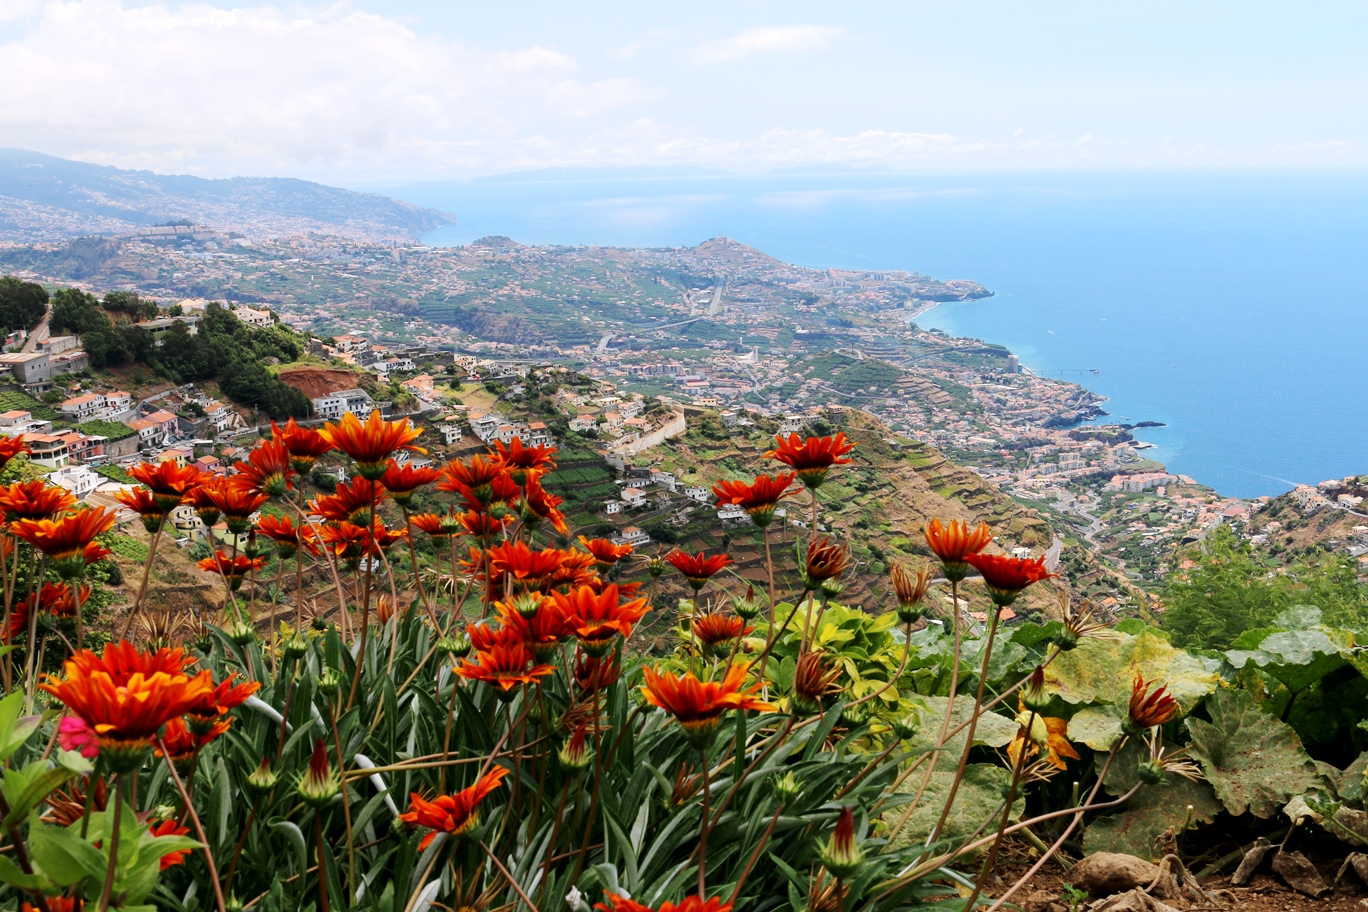 Funchal - Vistas de Madeira mientras manejas